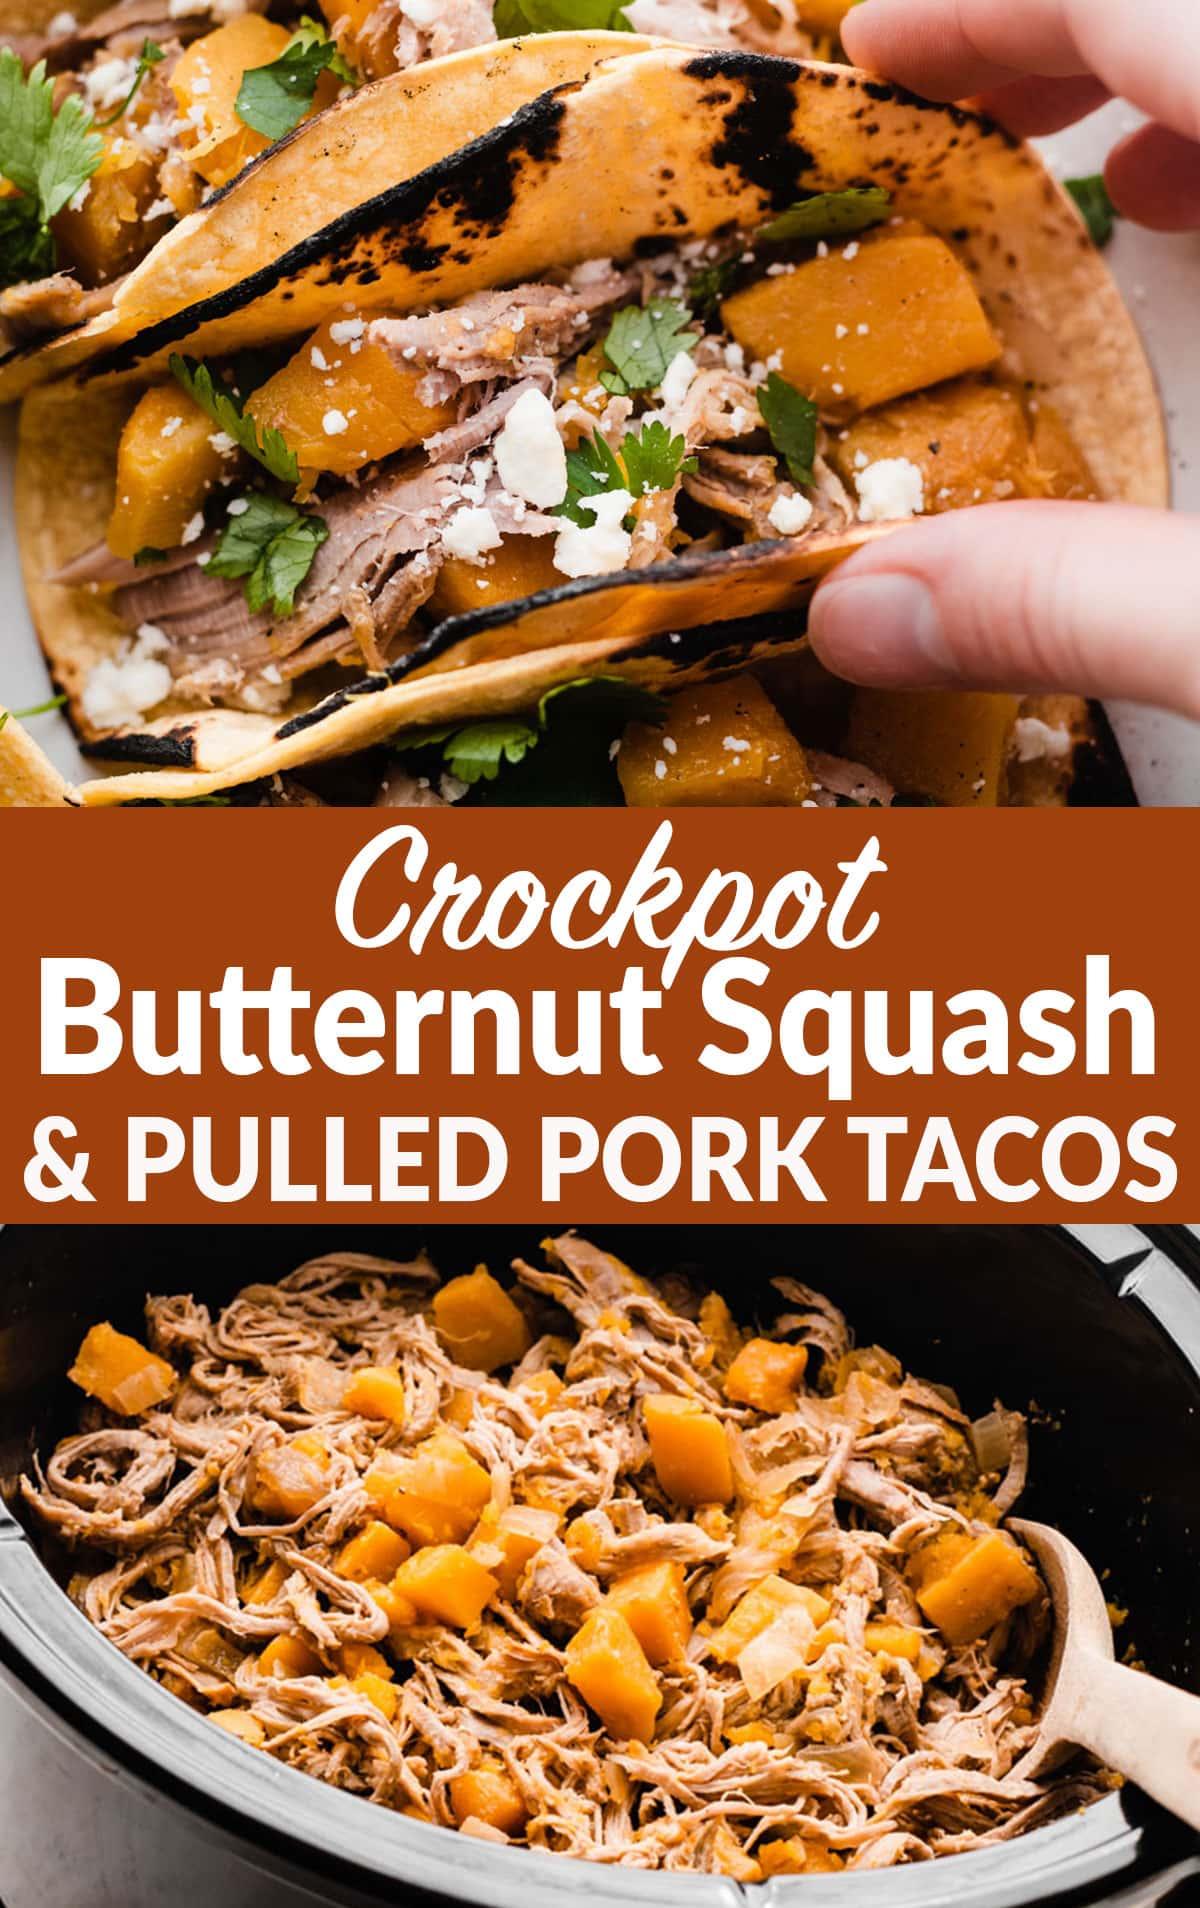 Slow Cooker Butternut Squash Pulled Pork Tacos